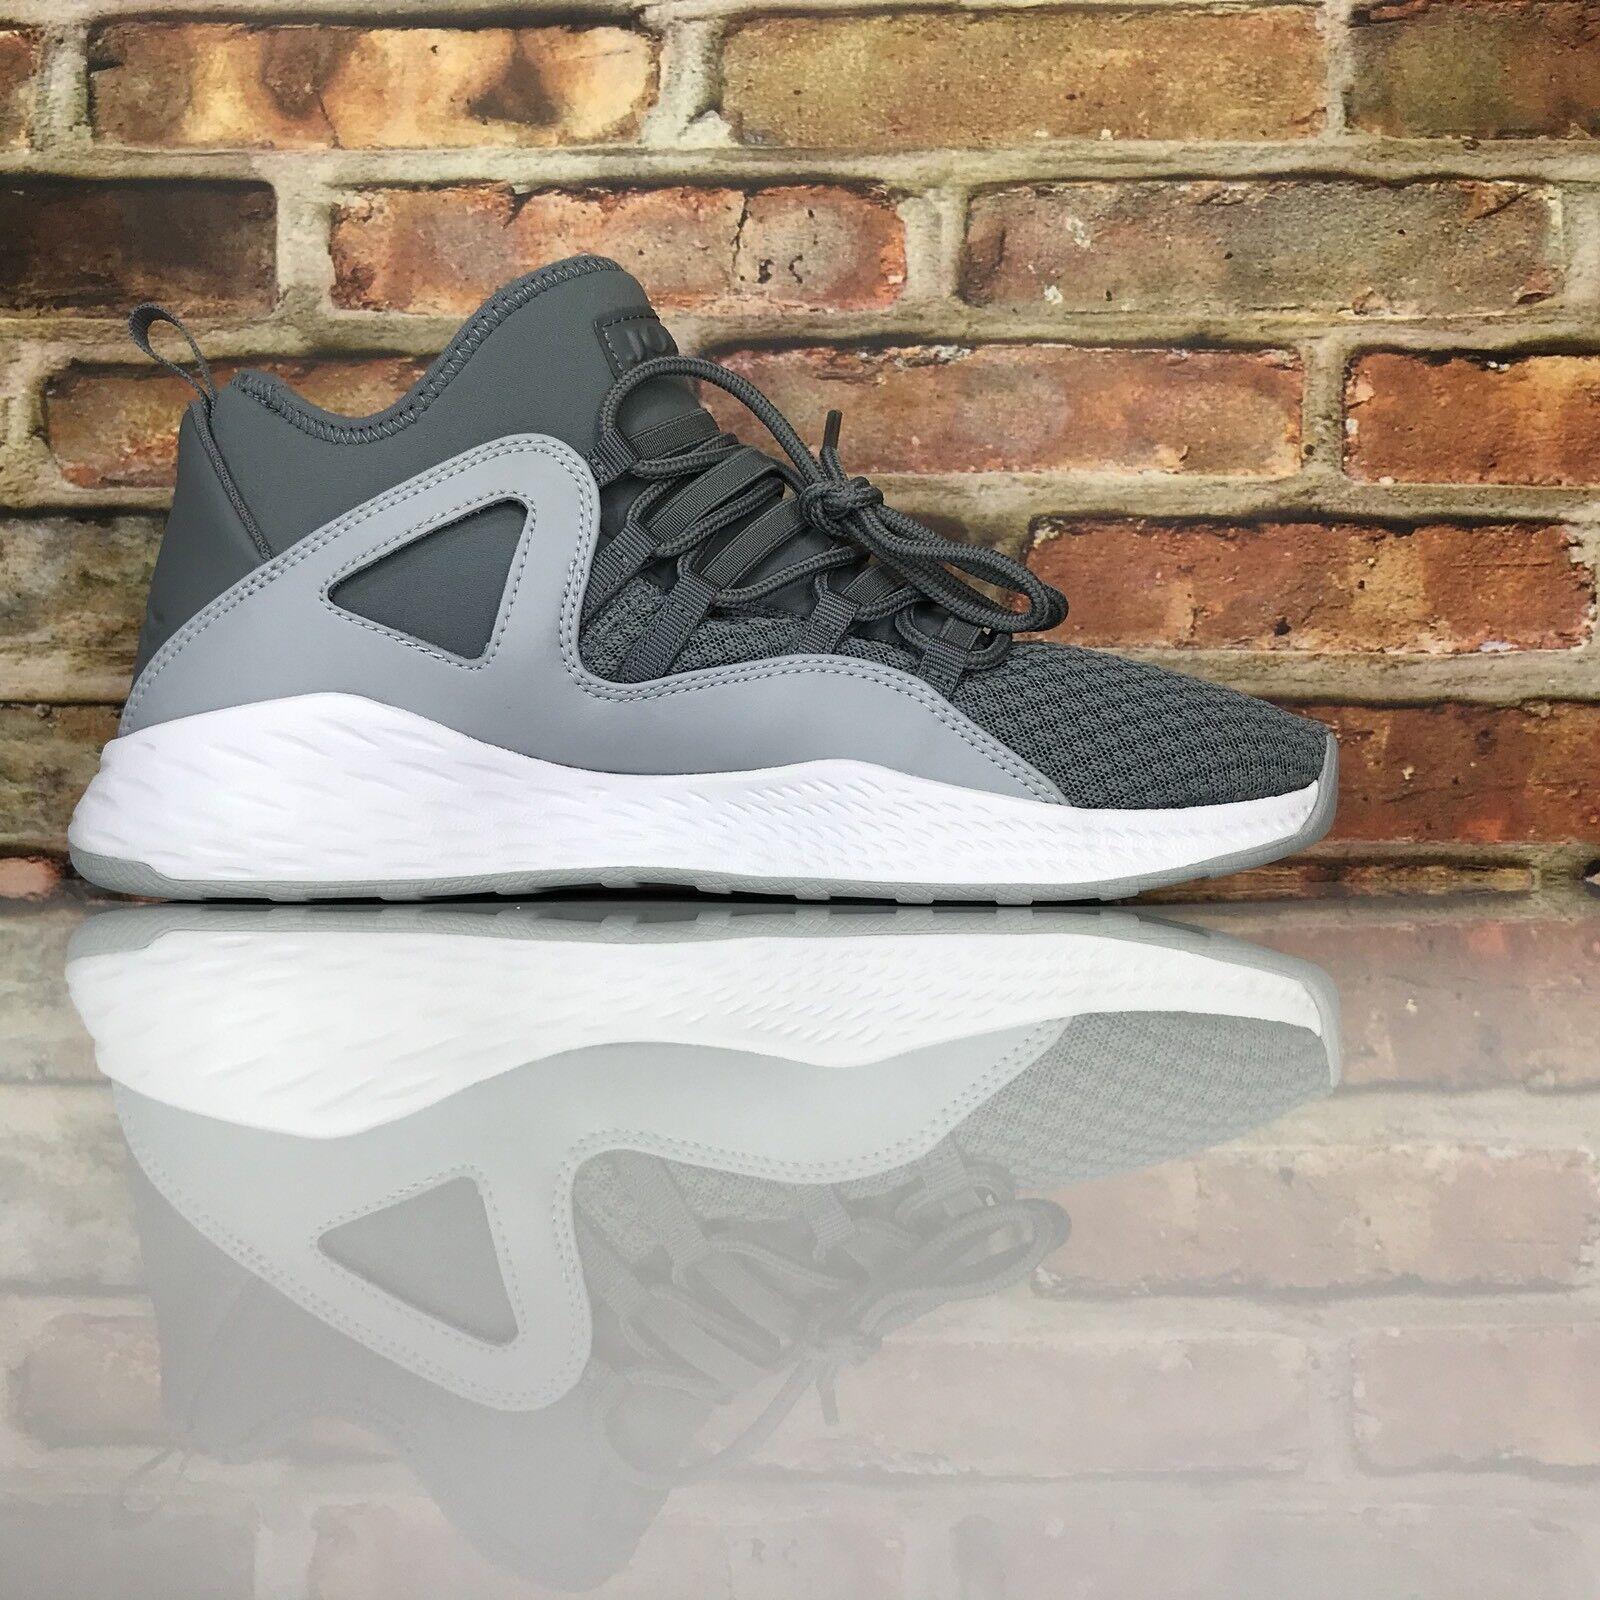 Jordan Formula 23 Mens Sz 9.5 Basketball shoes Fashion Style Sneaker Lightweight